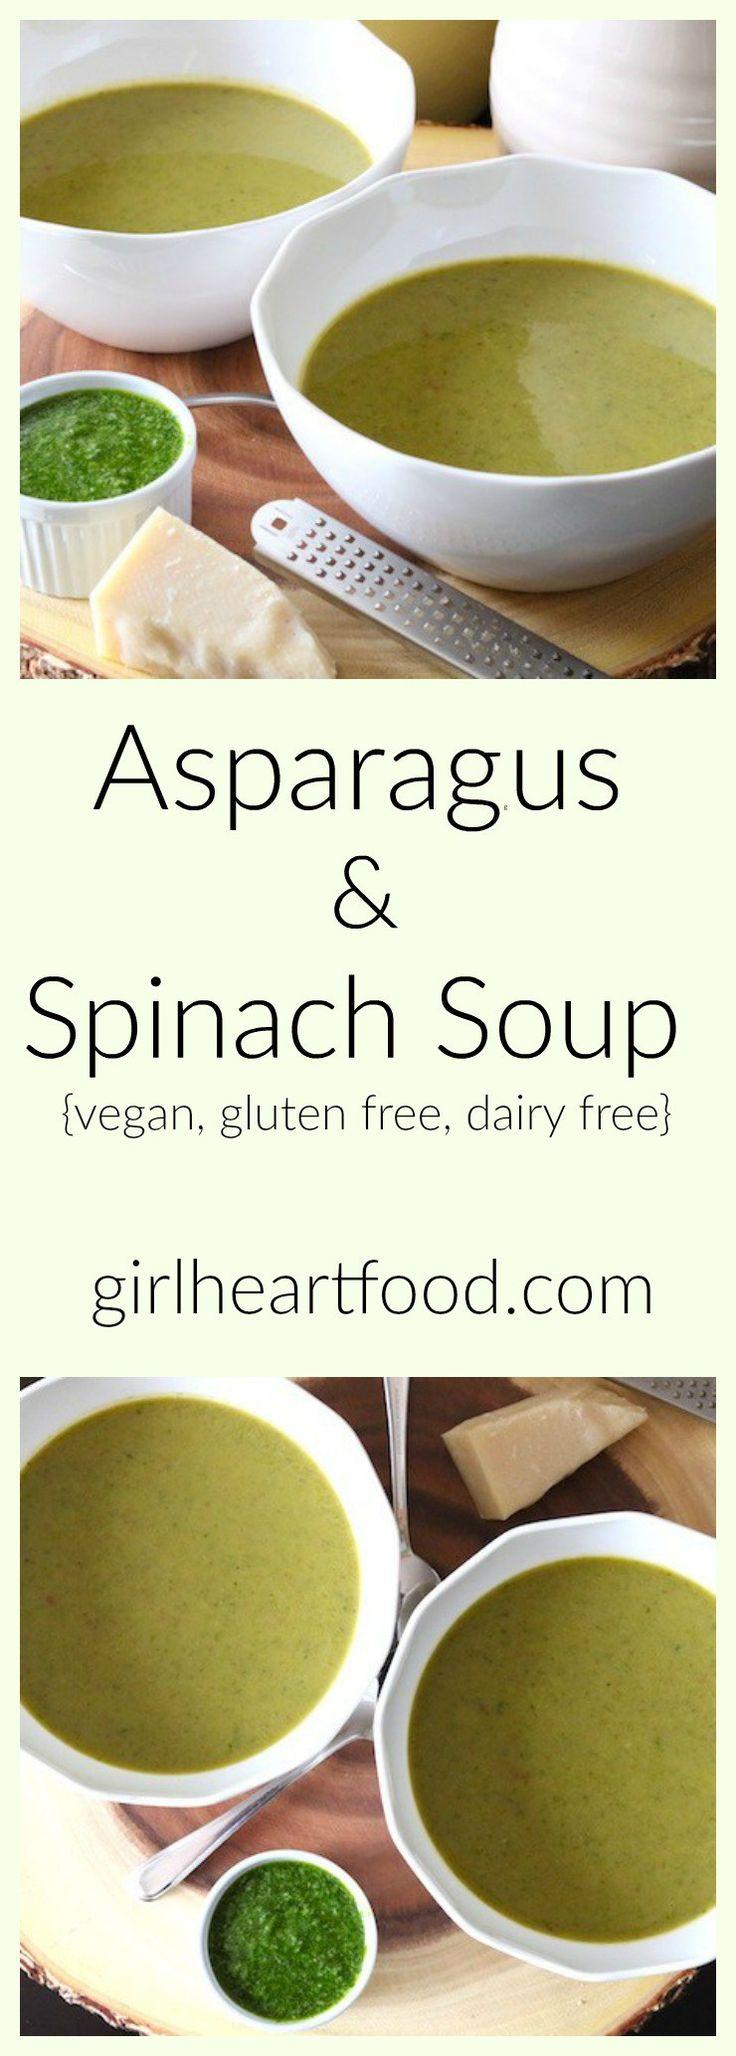 Asparagus & Spinach Soup {vegan, gluten free & dairy free} - girlheartfood.com